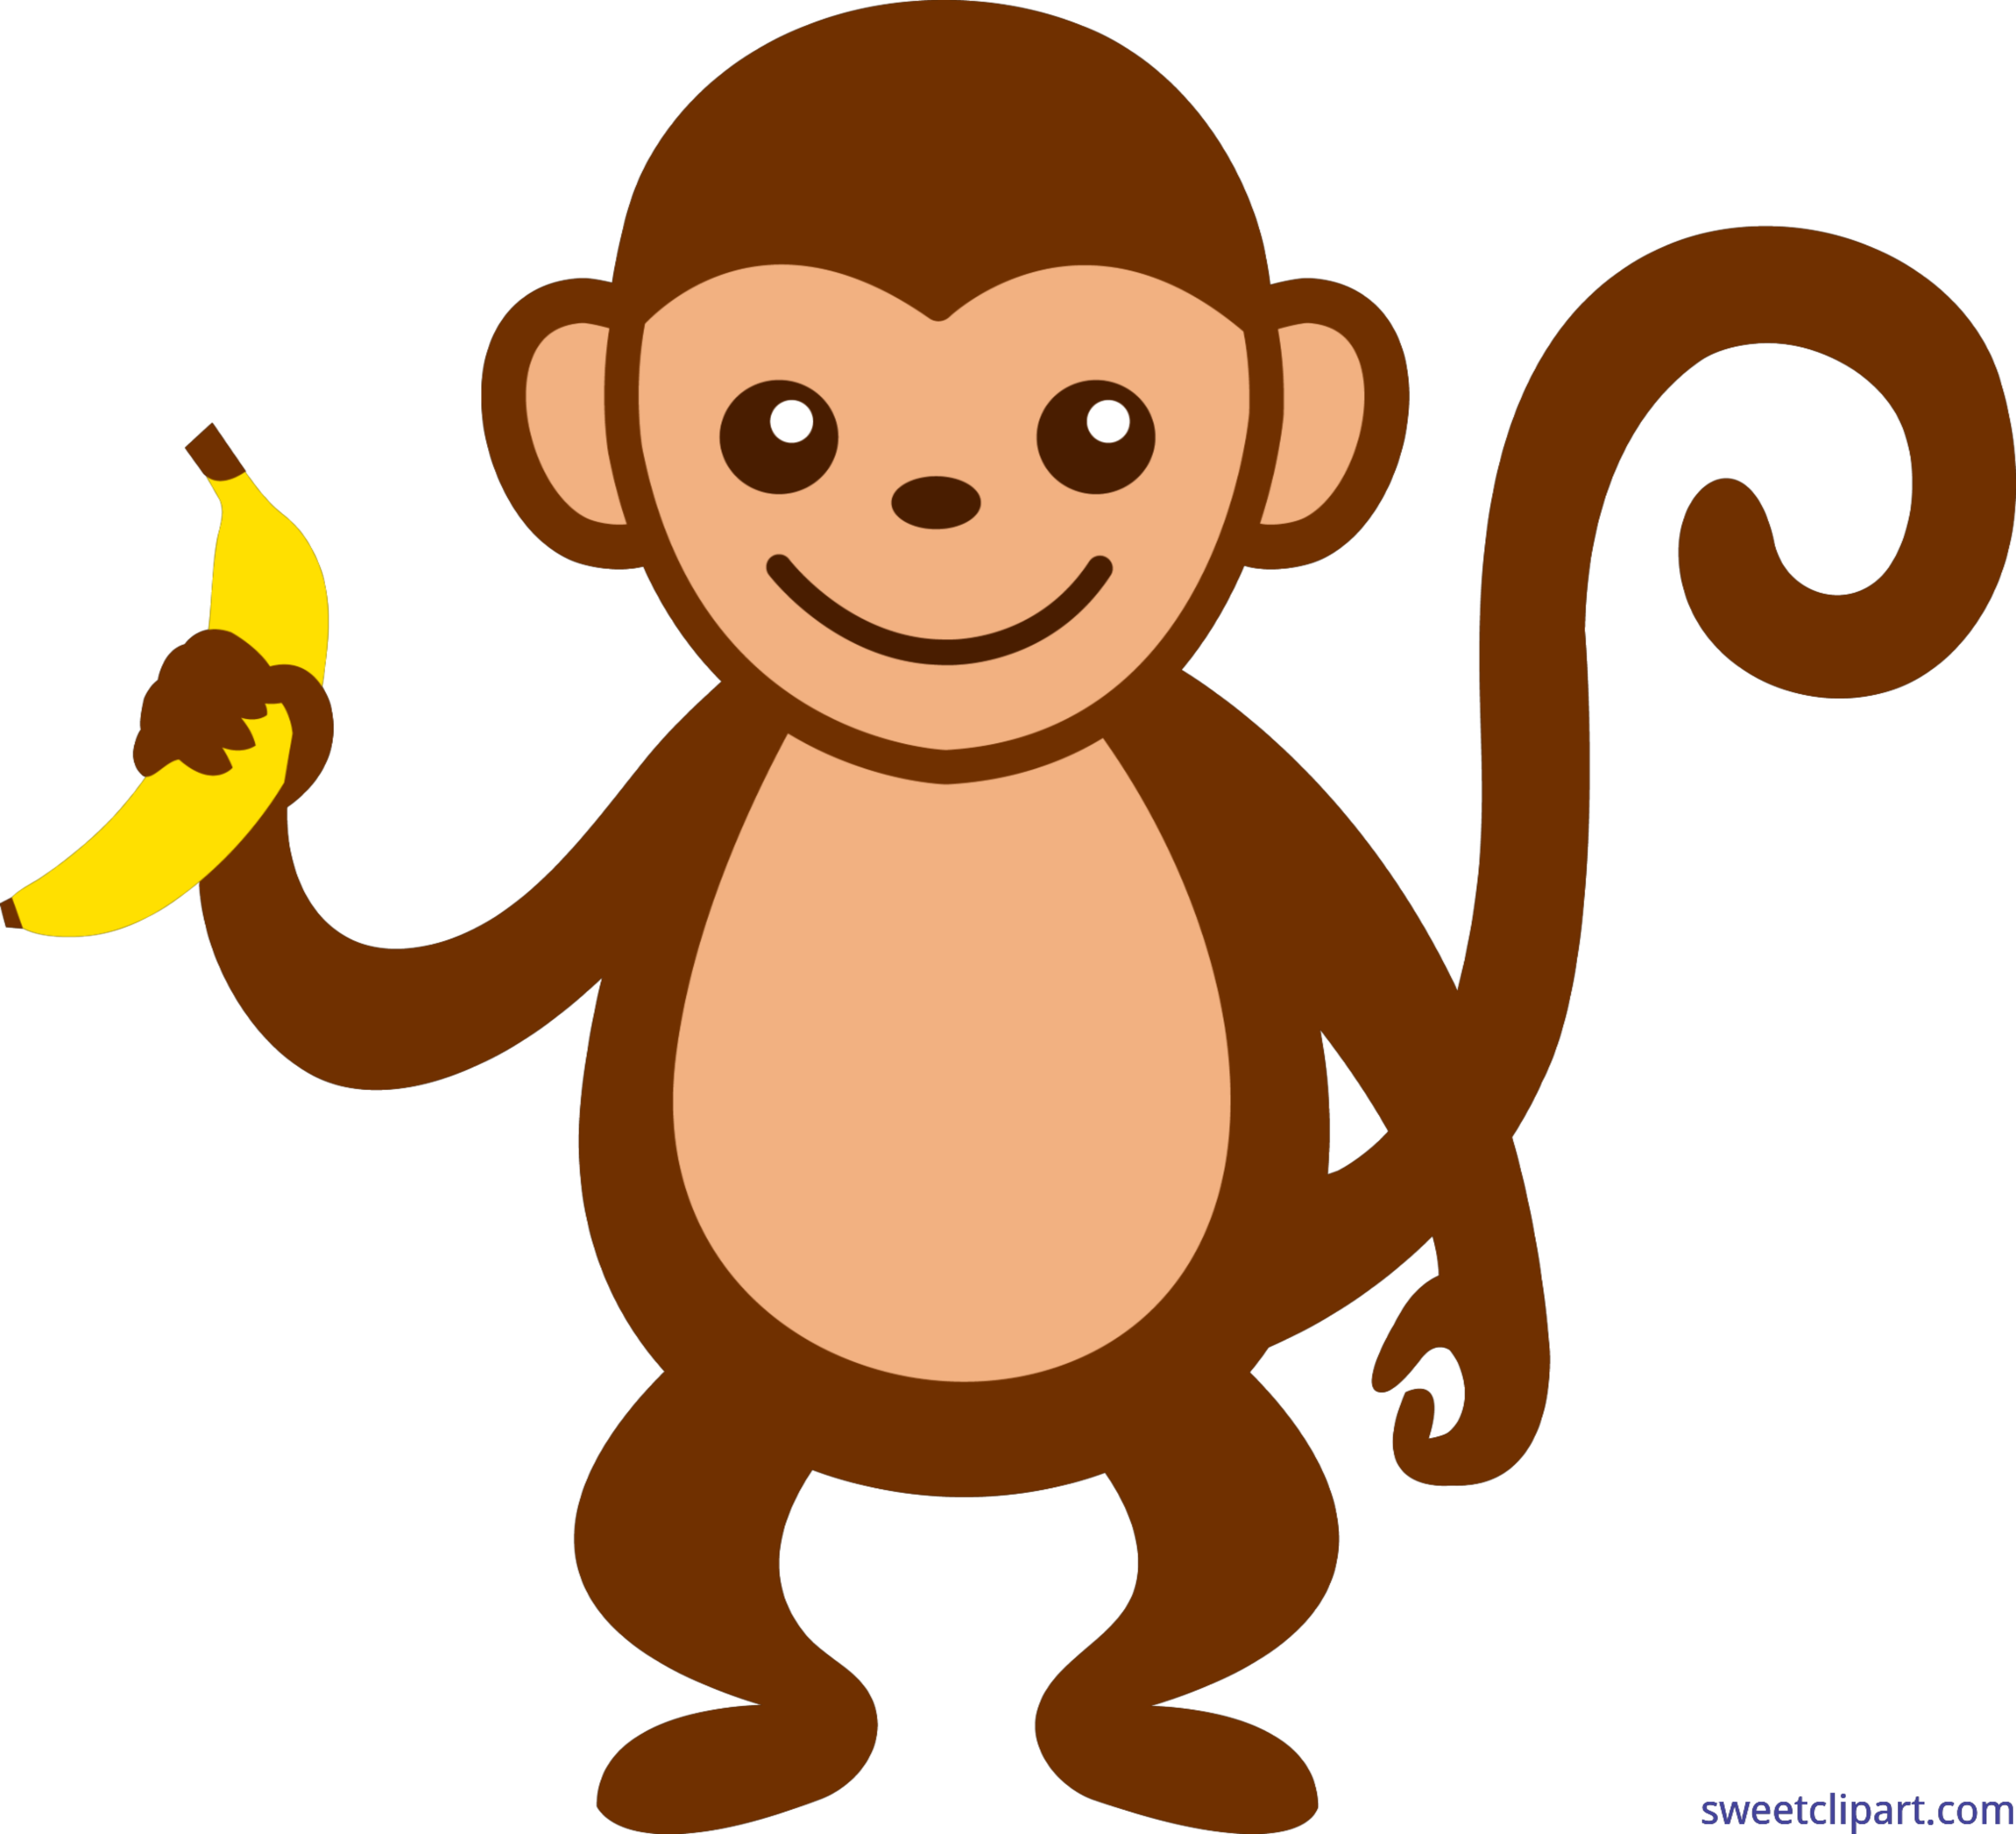 With banana clip art. Food clipart monkey